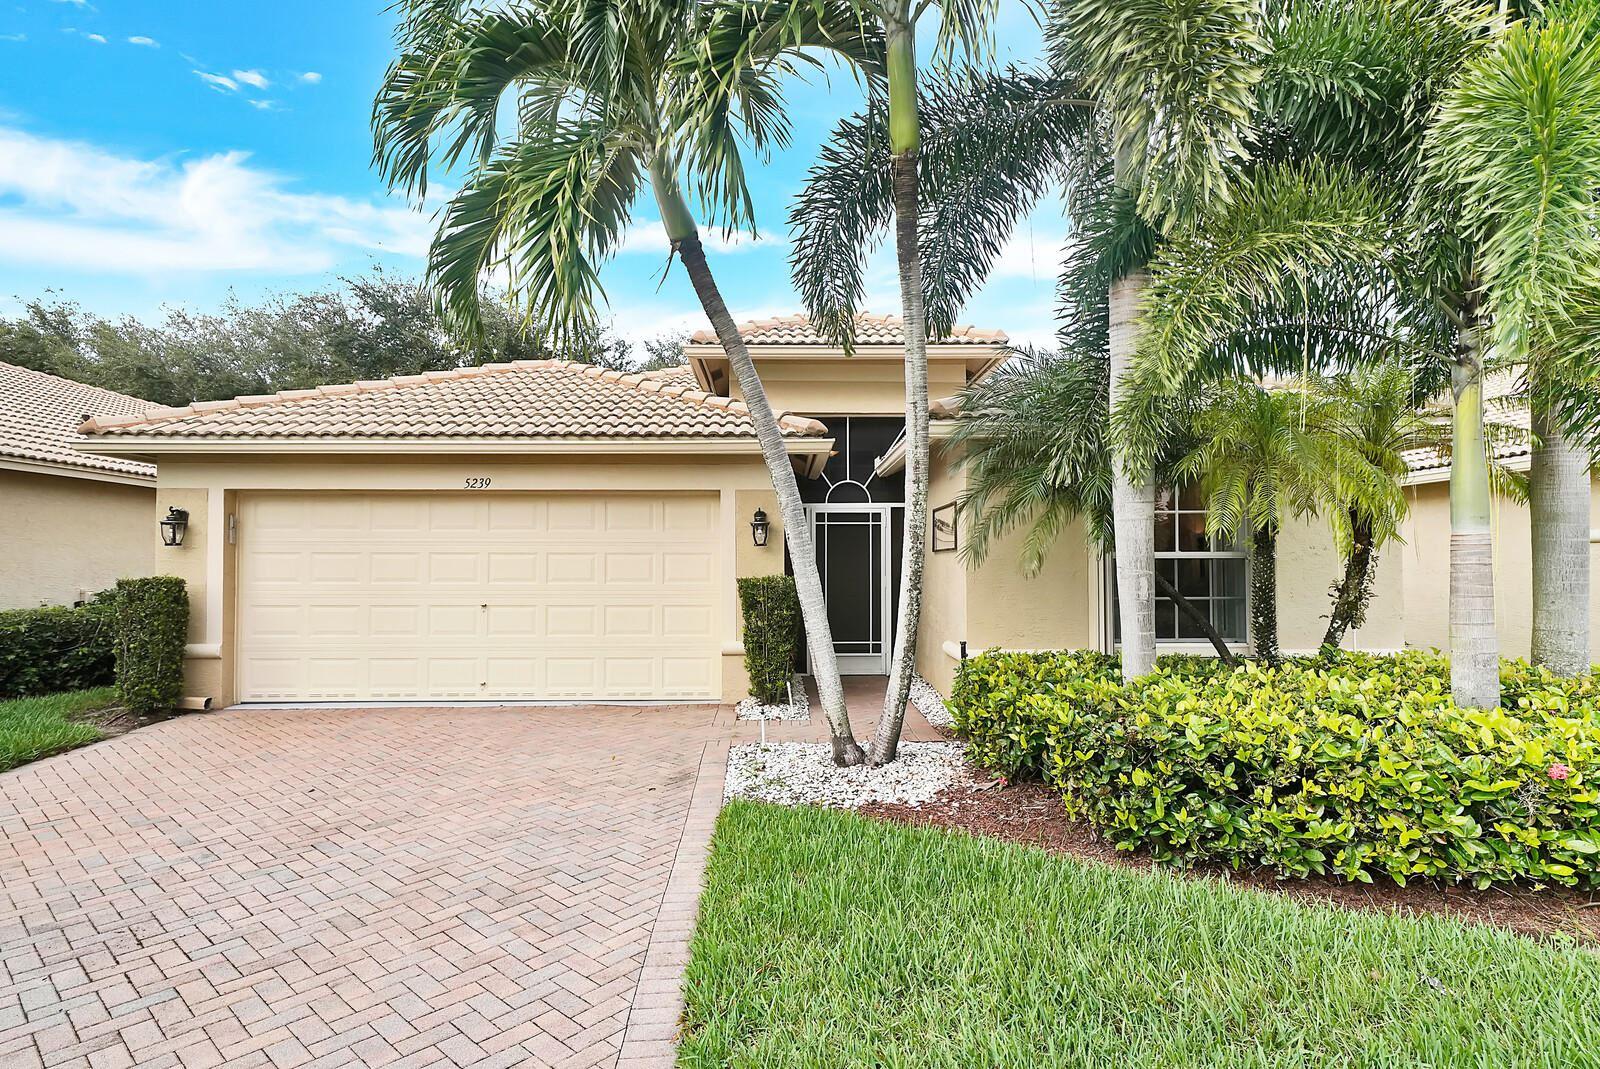 5239 Espana Avenue, Boynton Beach, FL 33437 - #: RX-10671525